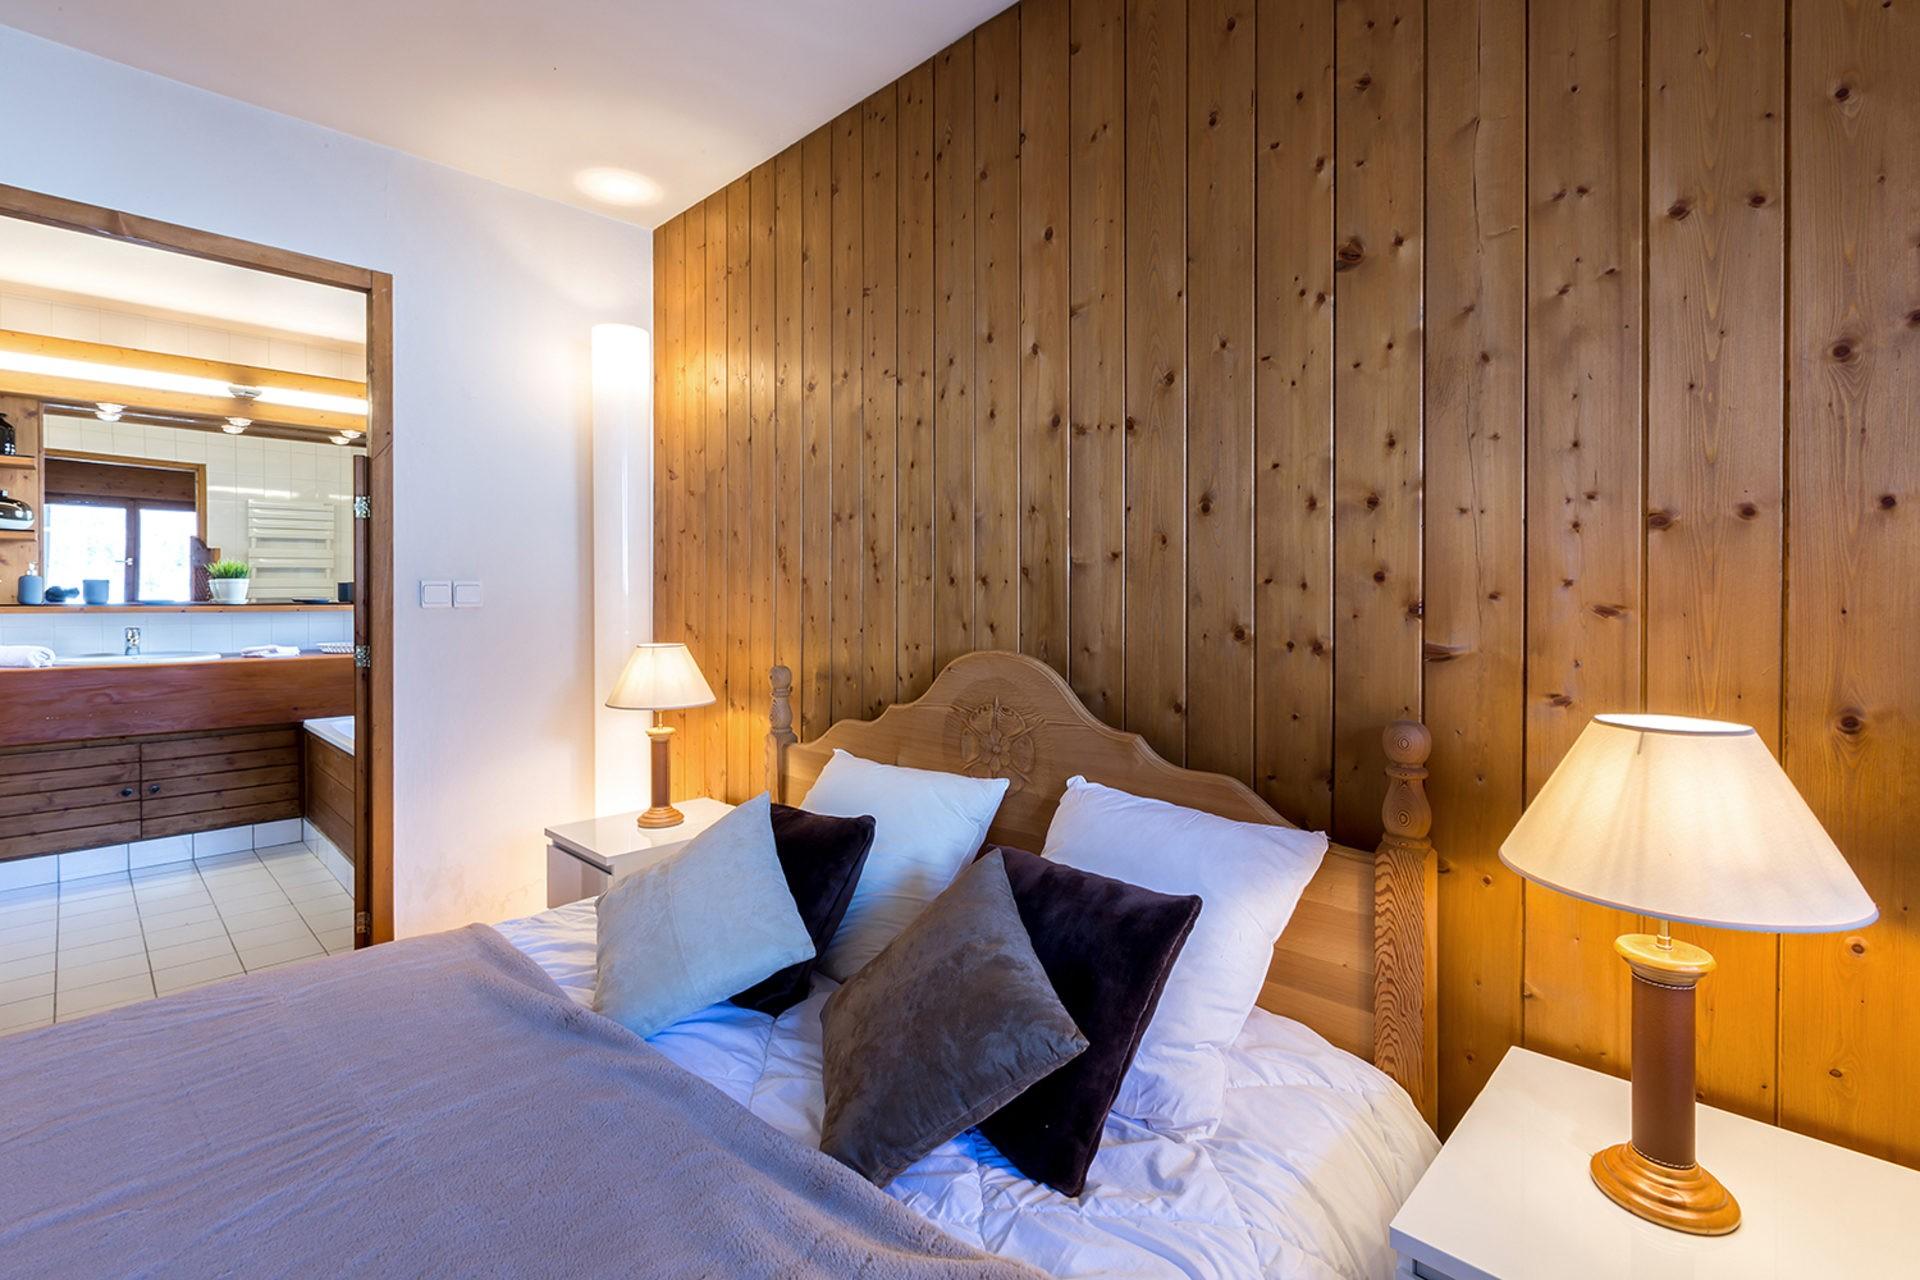 Val d'Isère Location Appartement Luxe Vesuvin Chambre